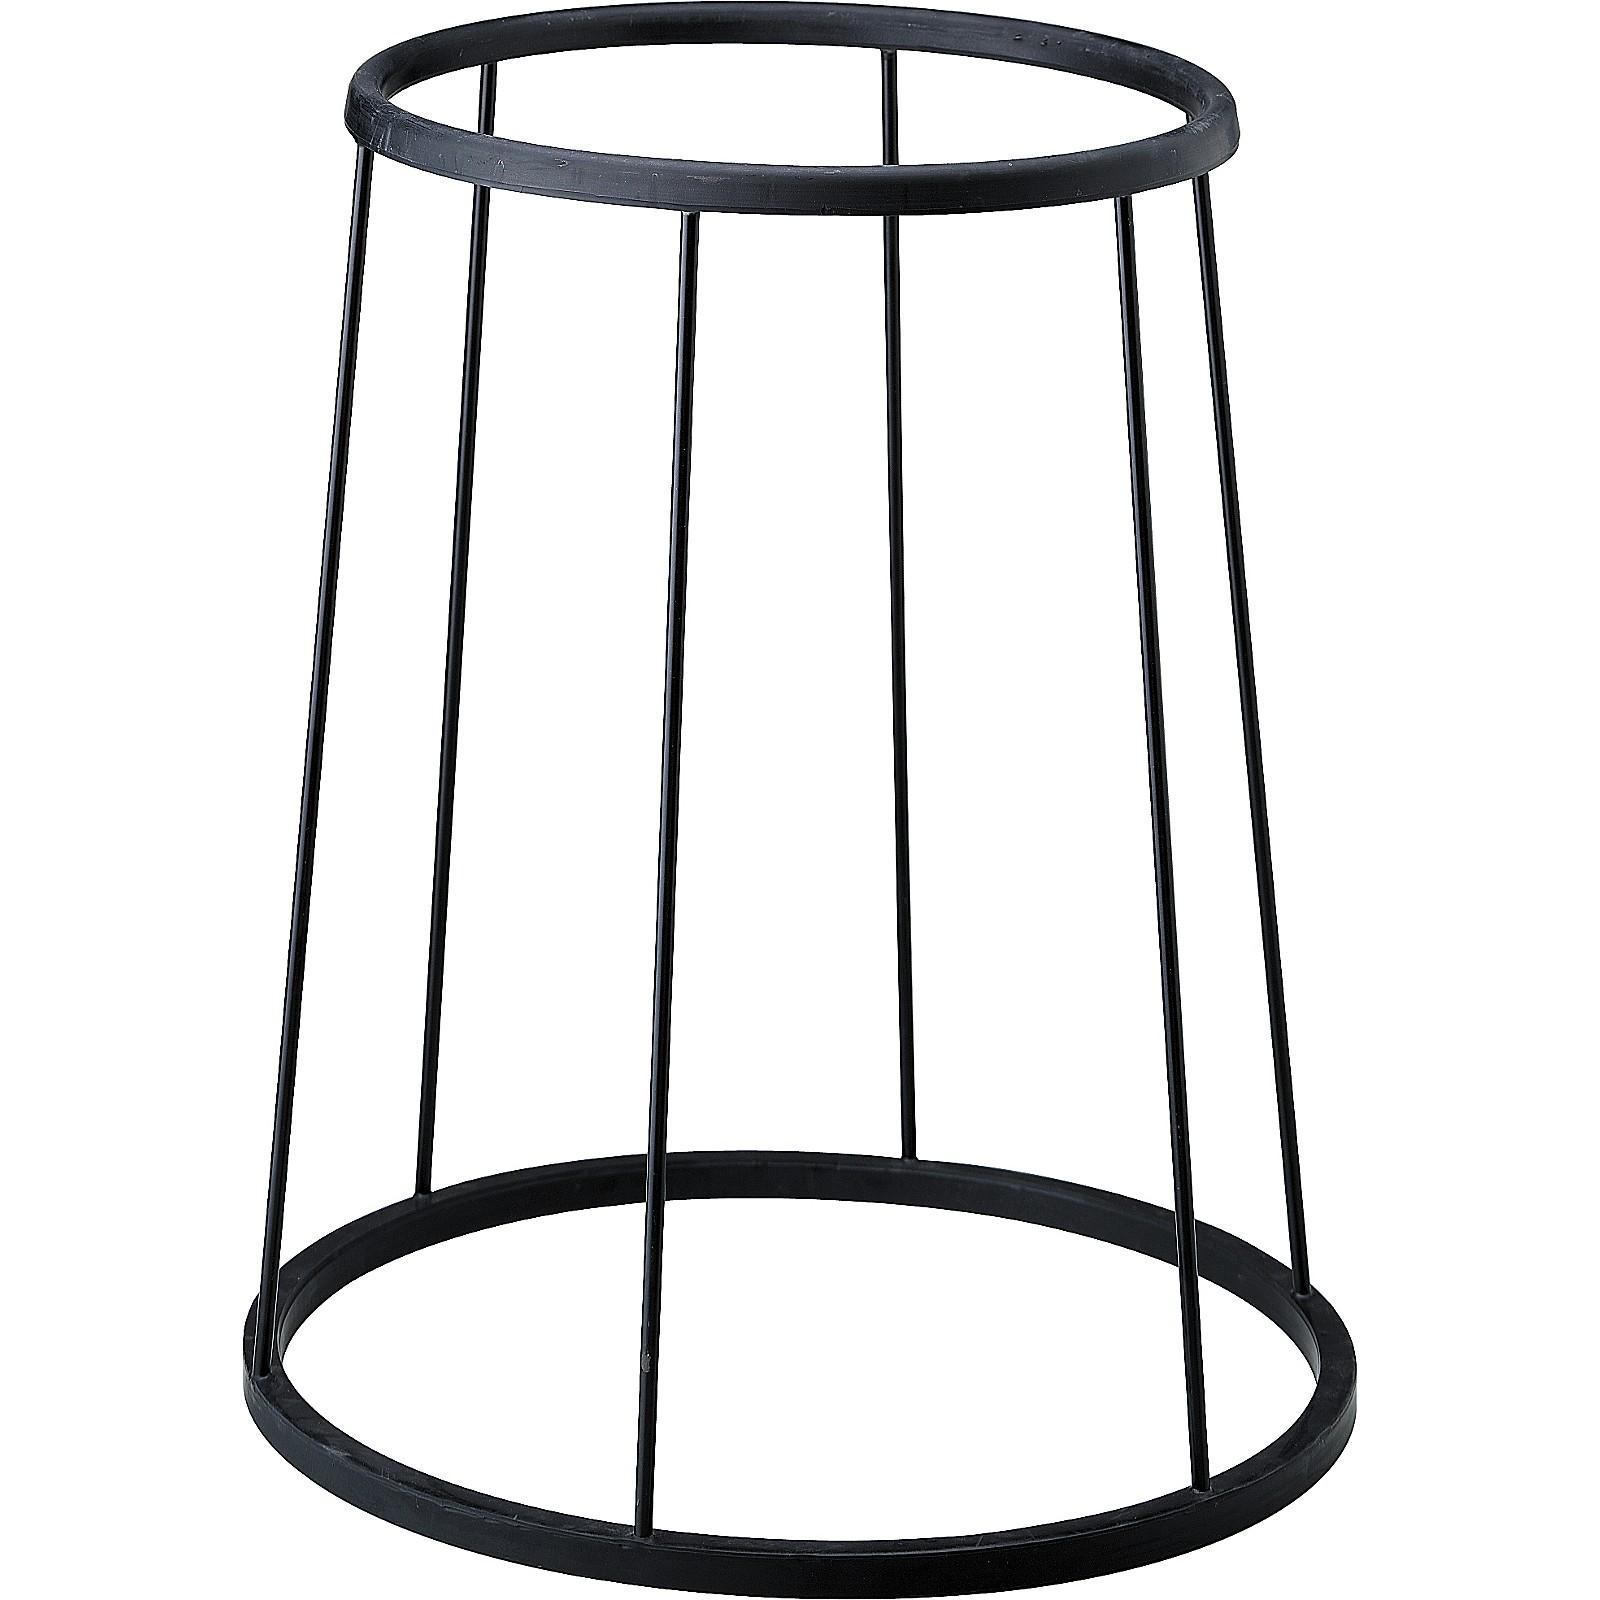 Remo Lightweight Djembe Floor Stand